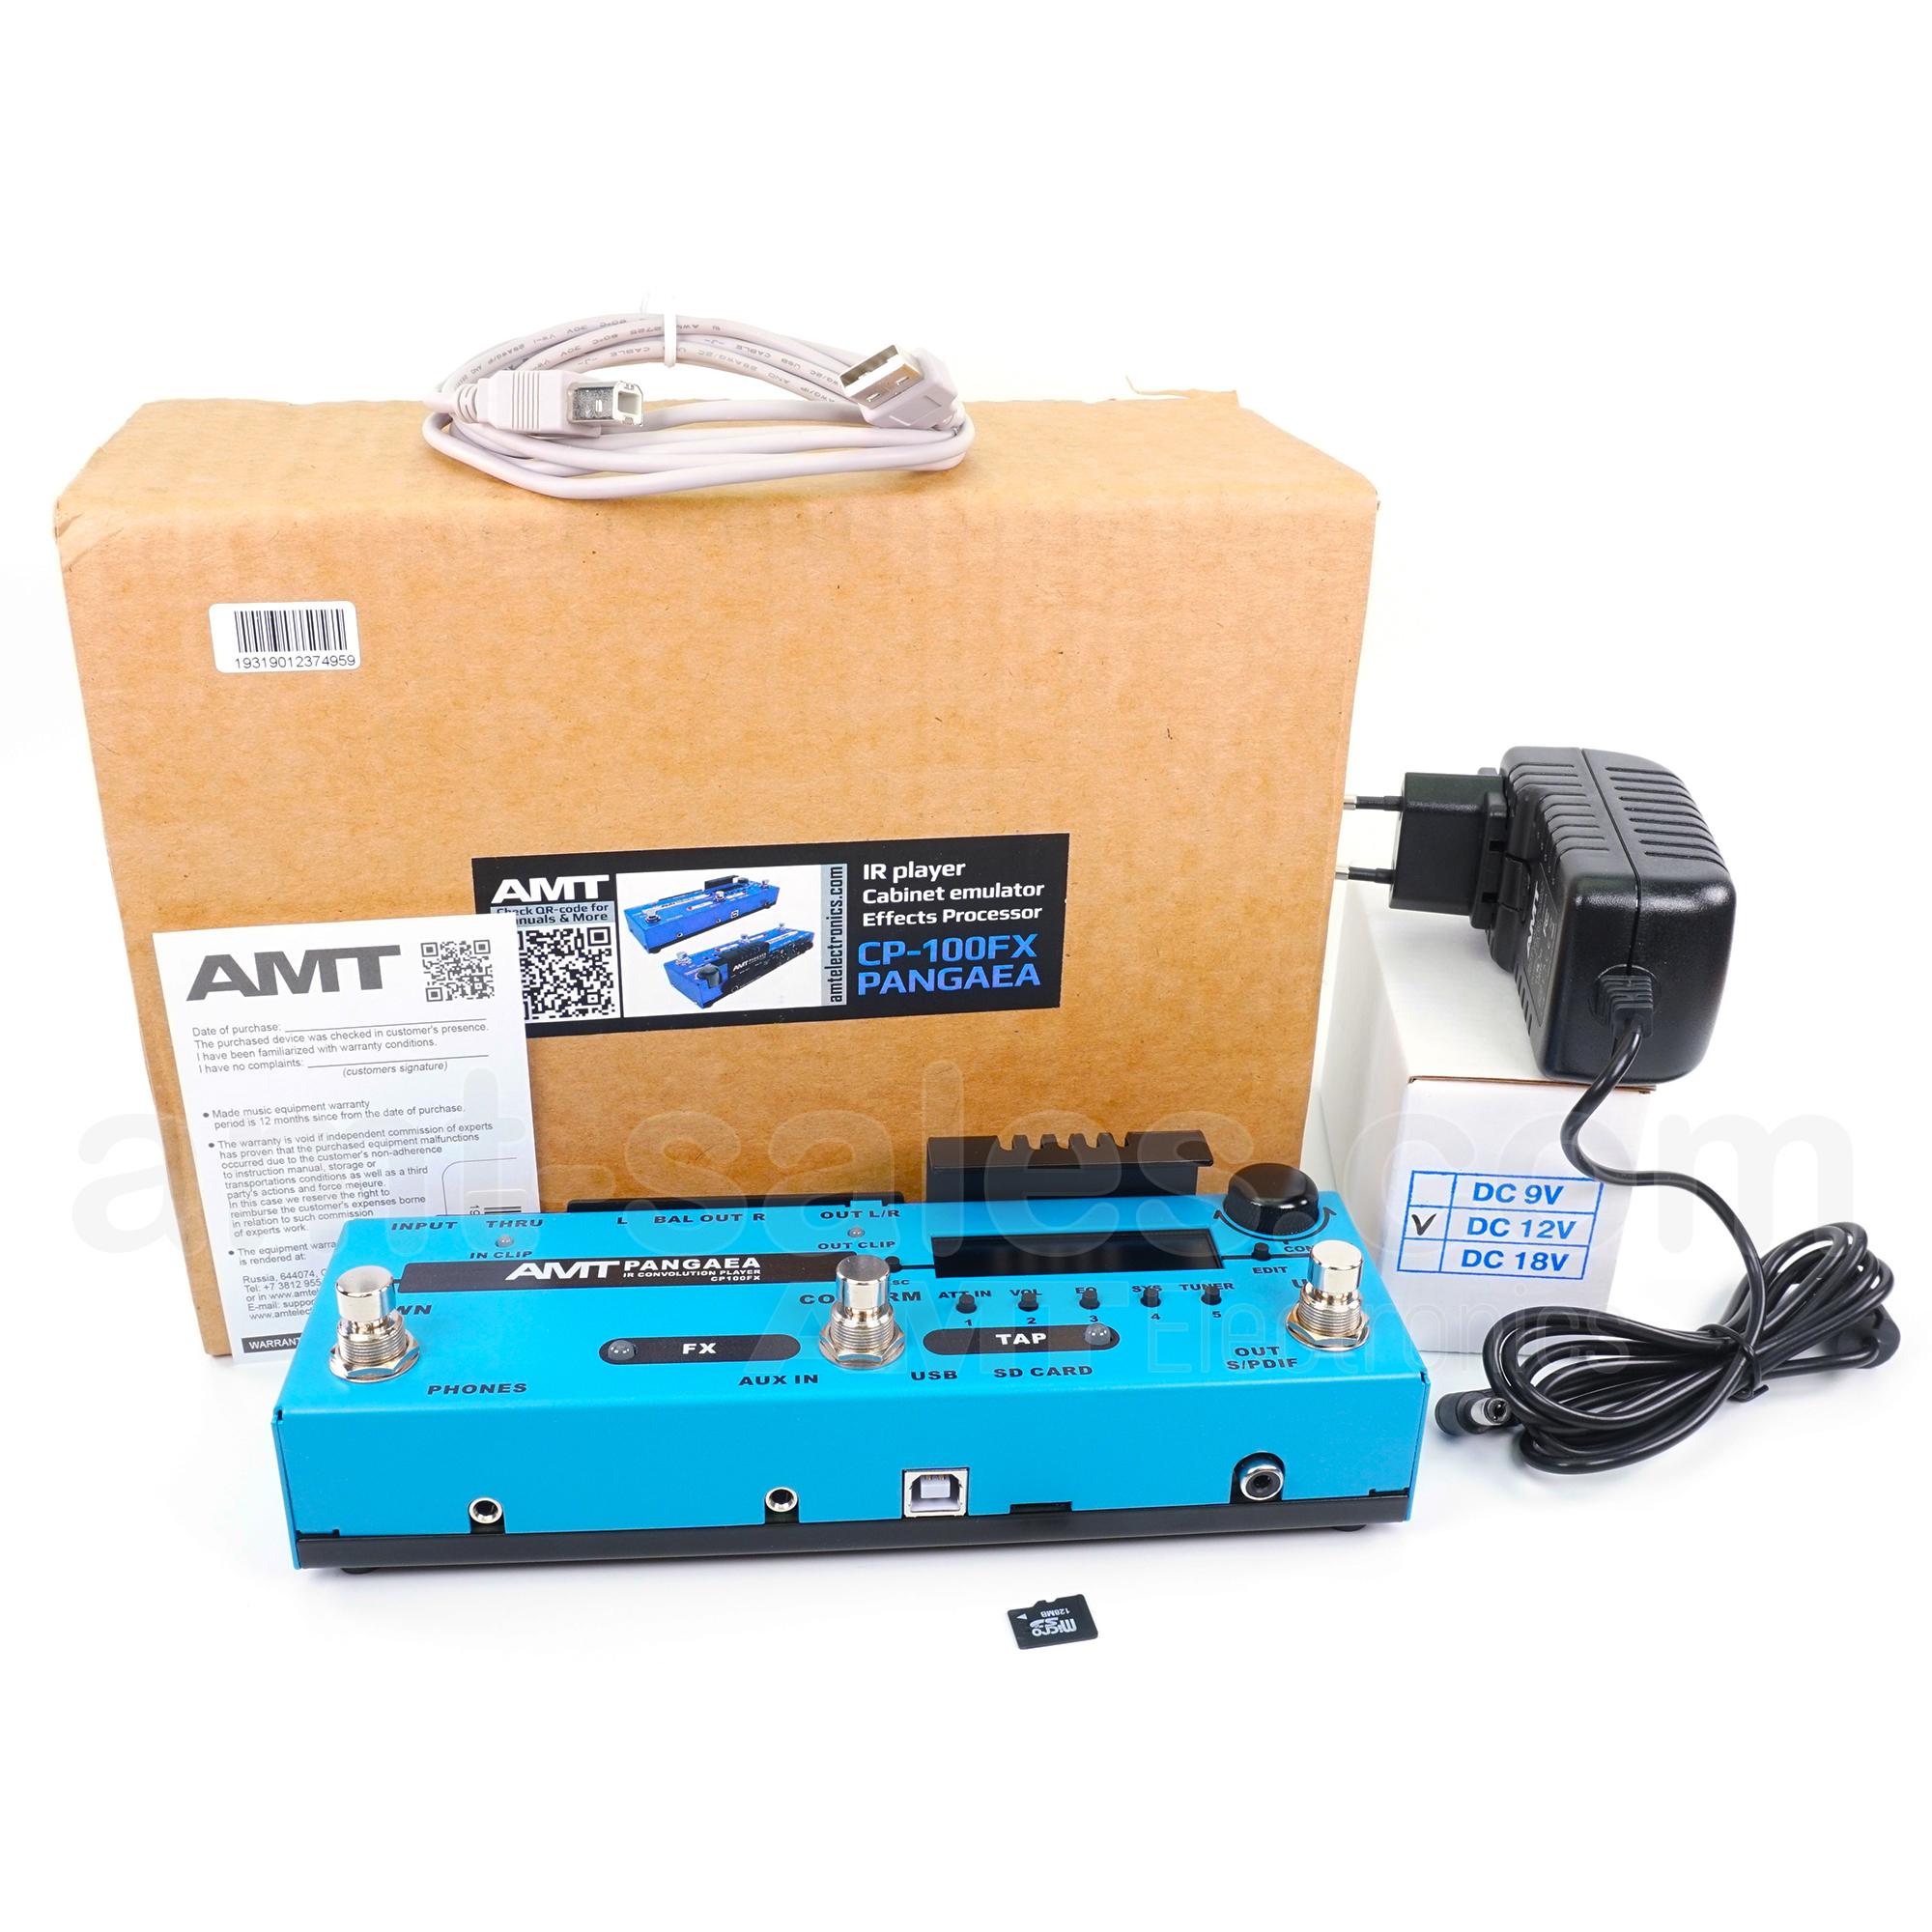 AMT PANGAEA CP-100FX